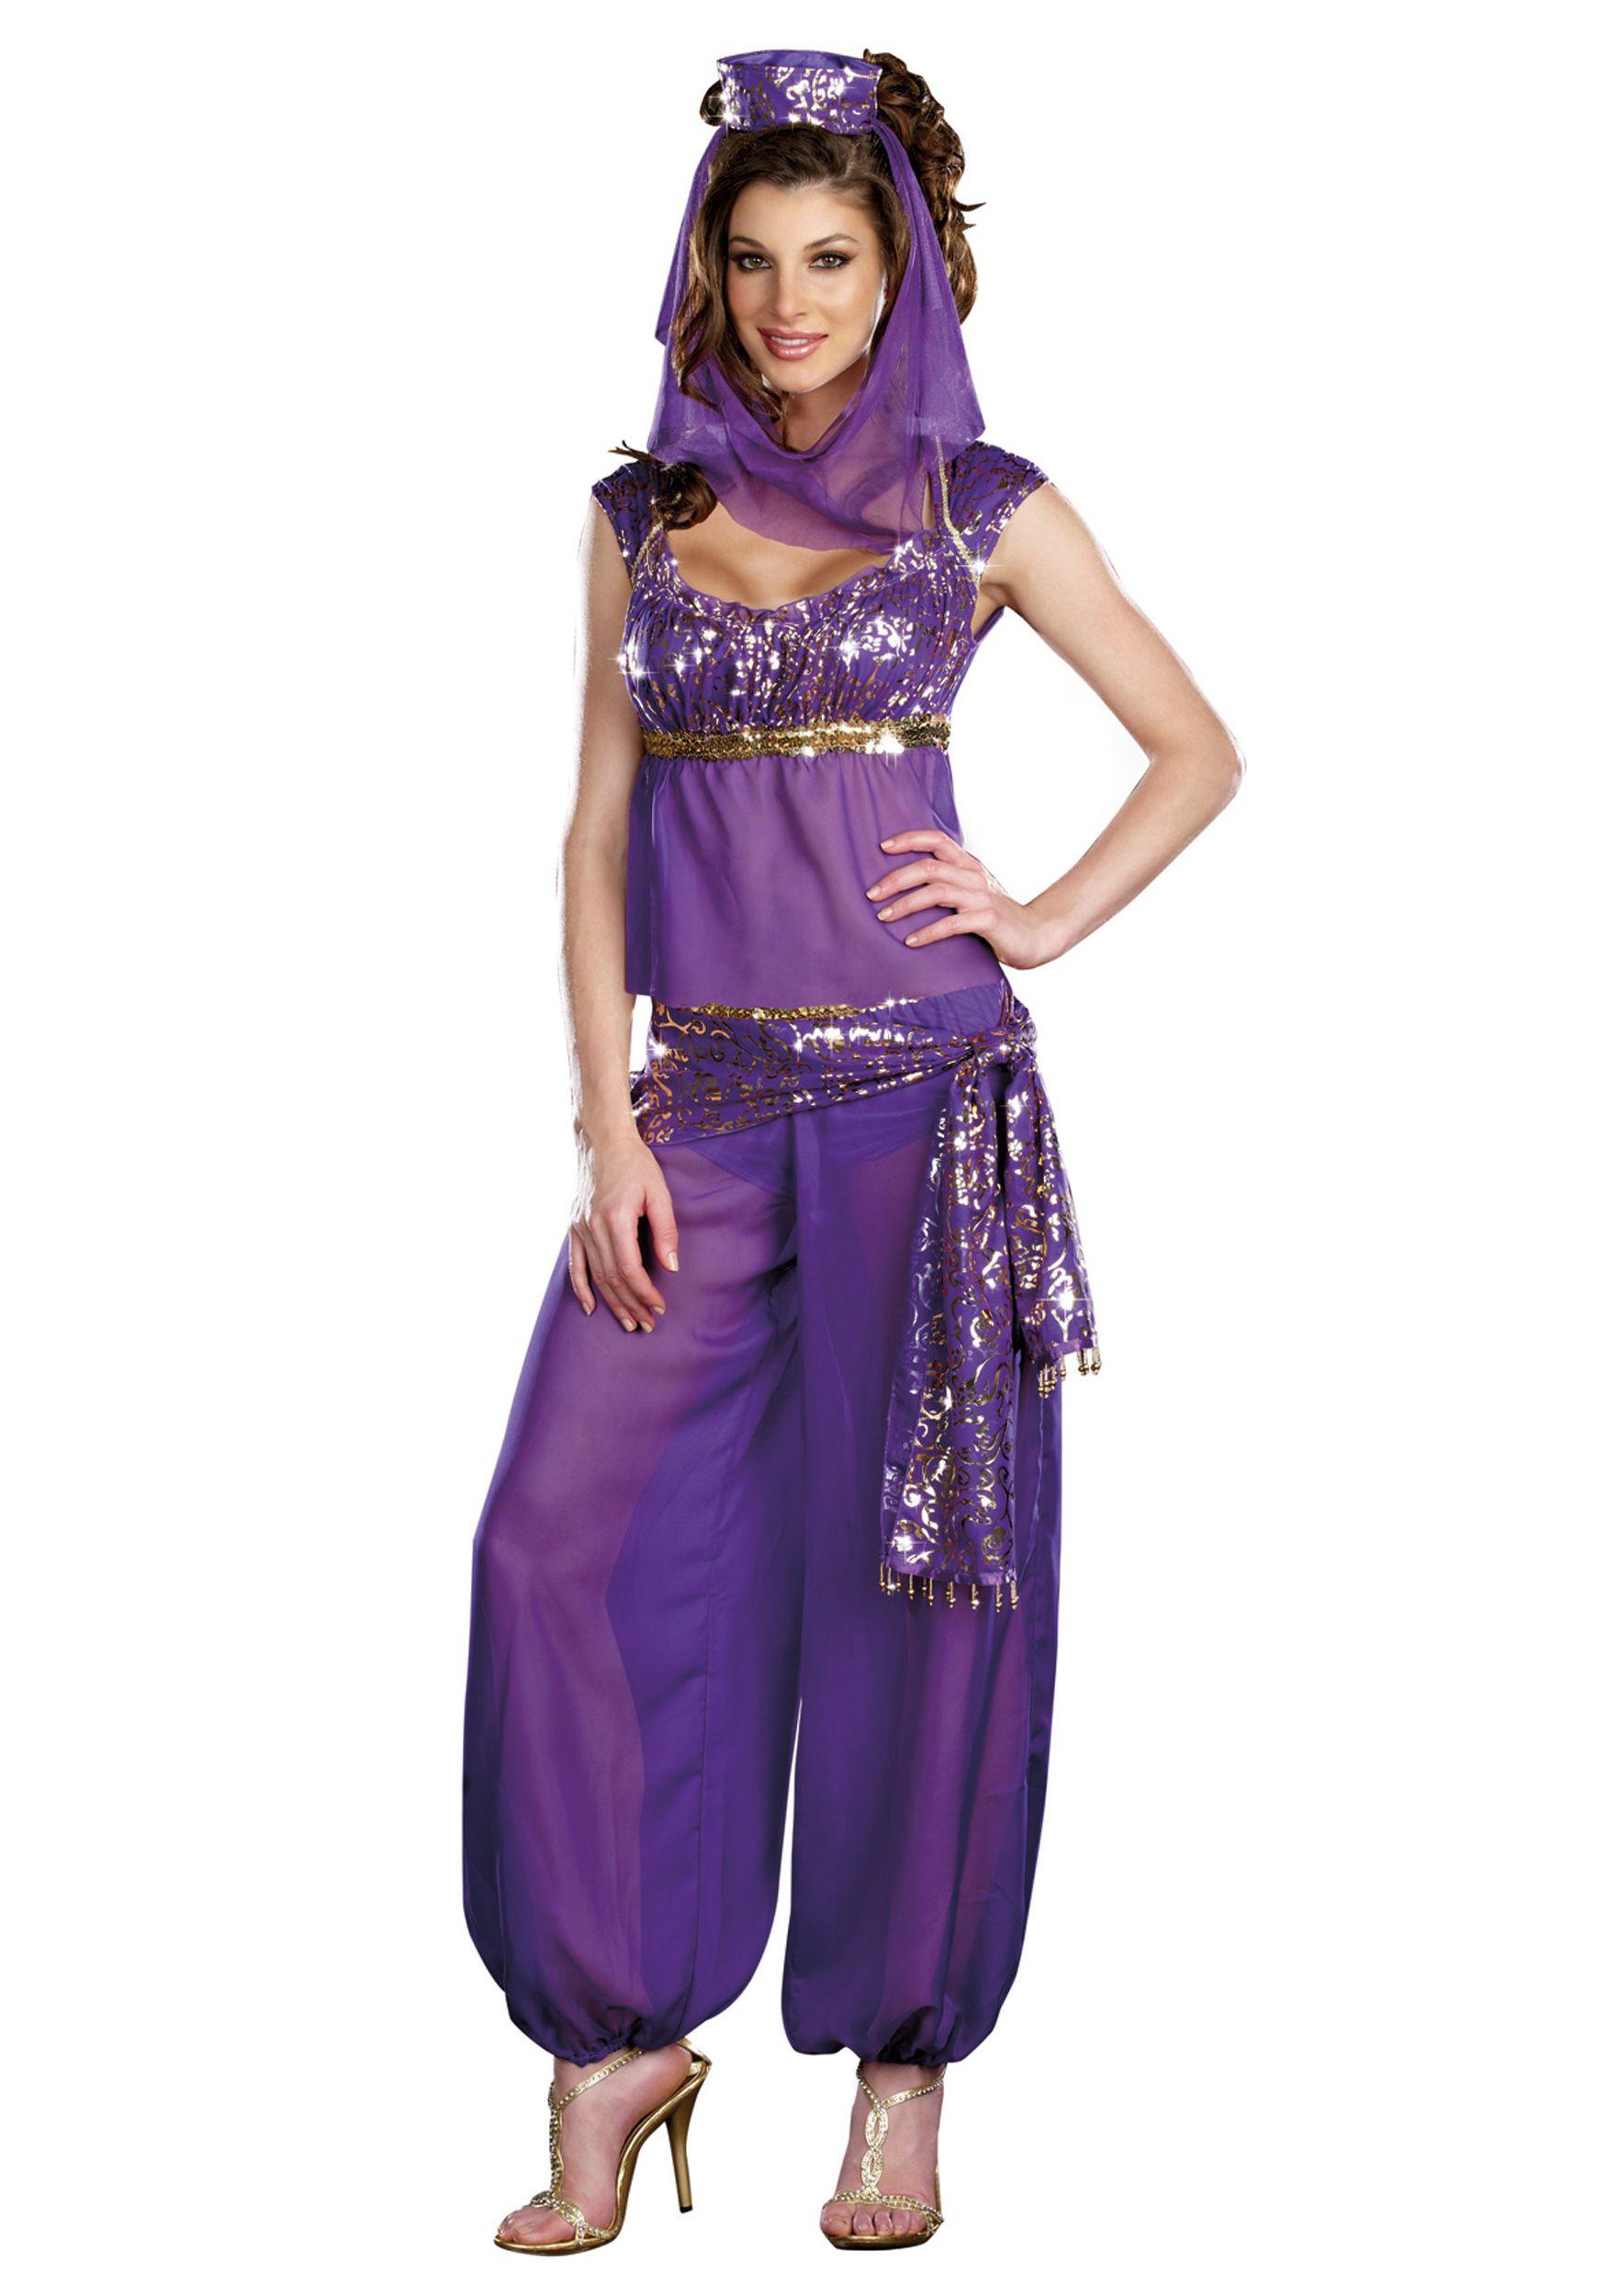 Sexy Purple Genie Costume | Halloween | Pinterest | Halloween ...